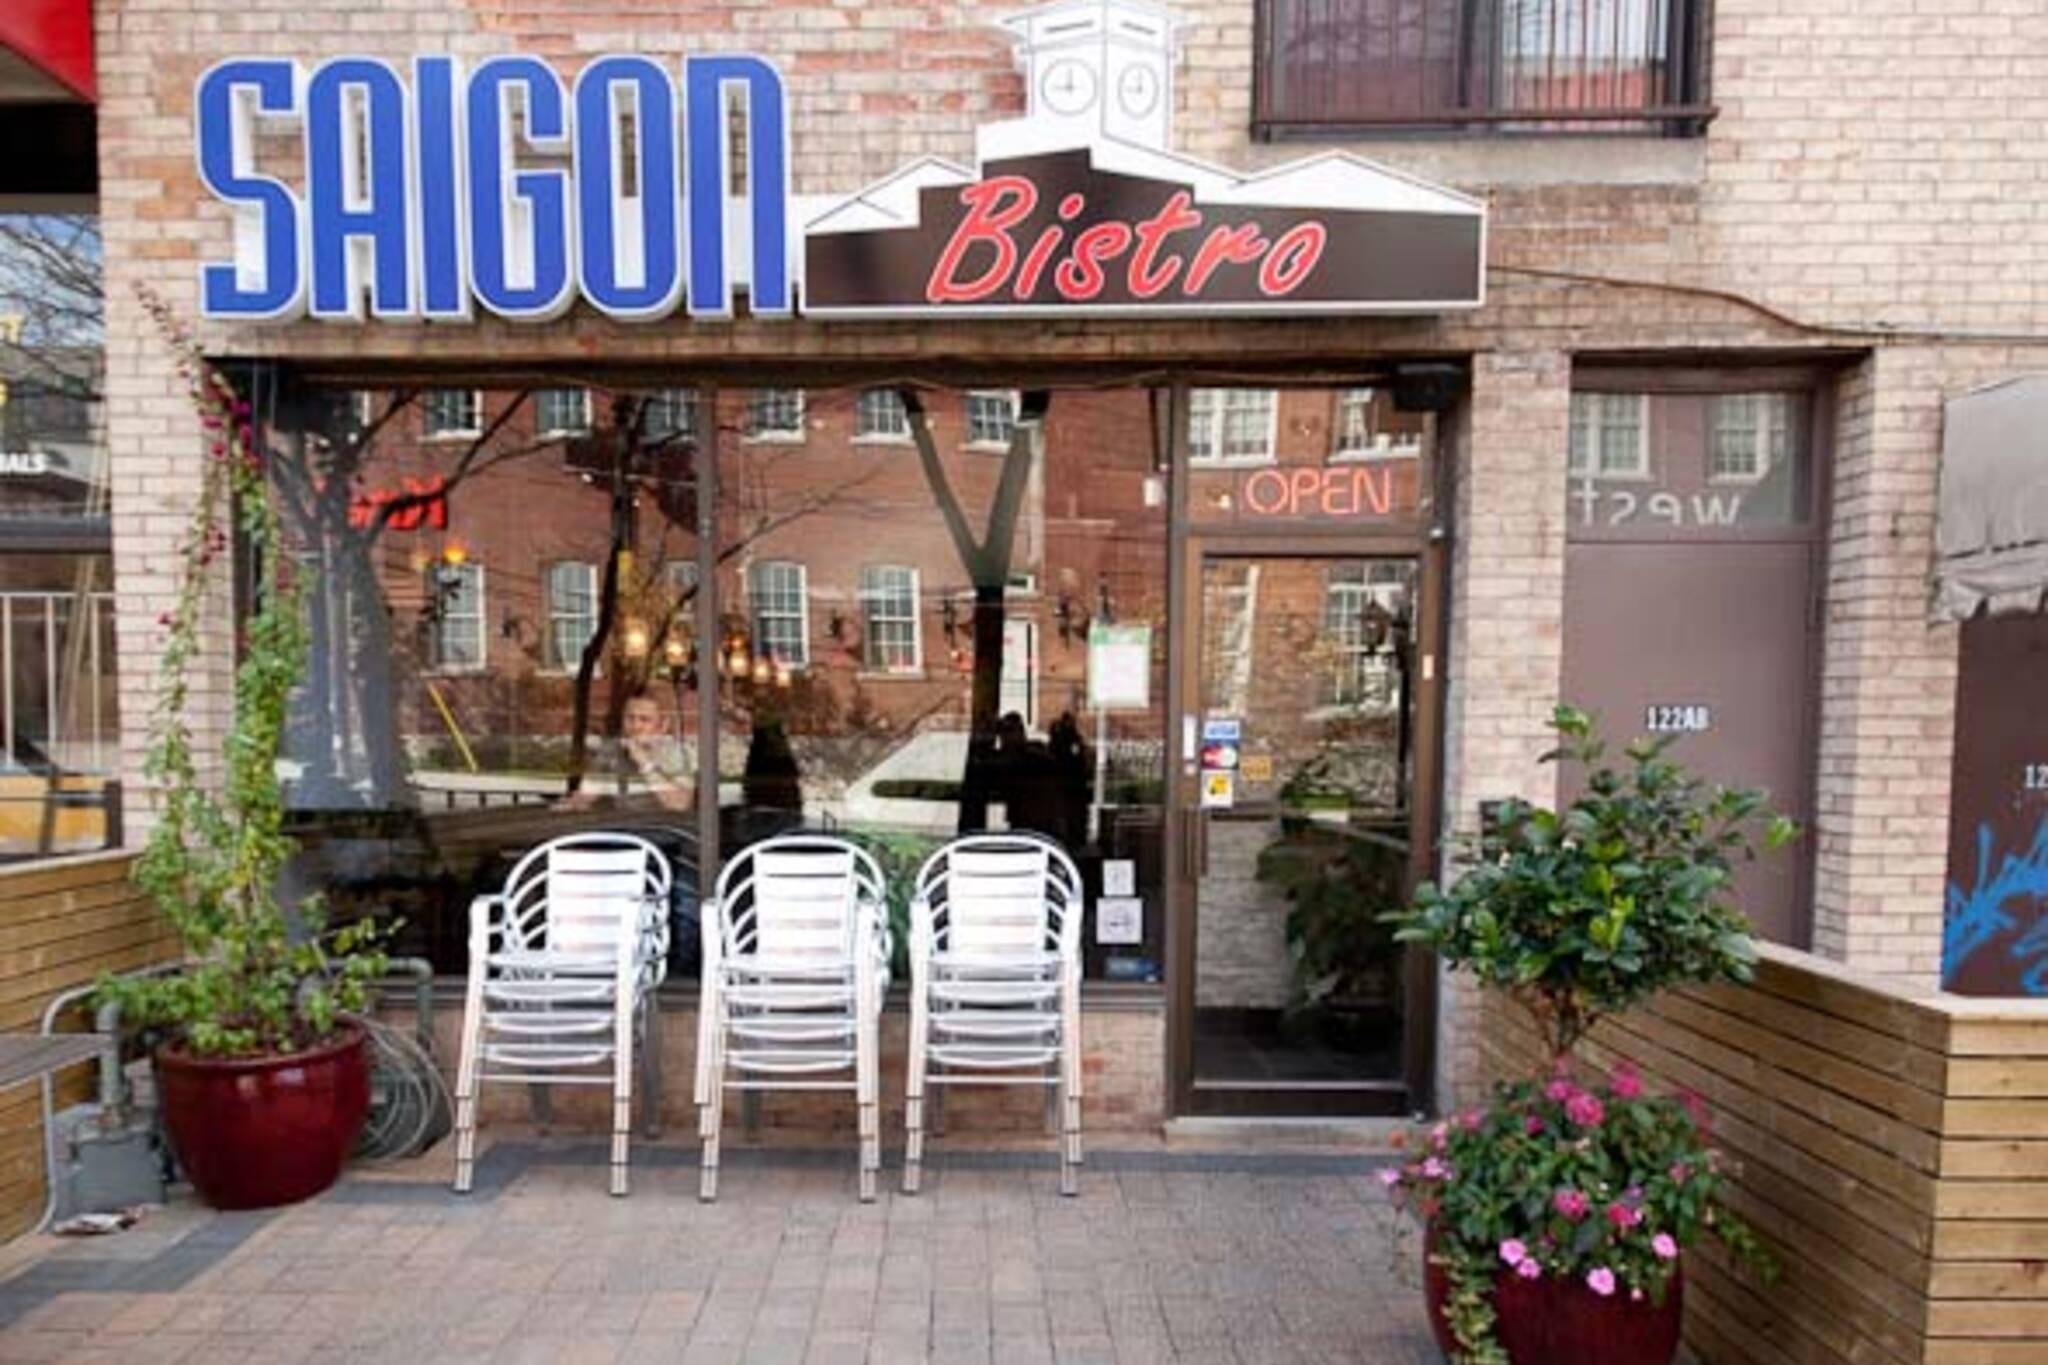 Saigon Bistro